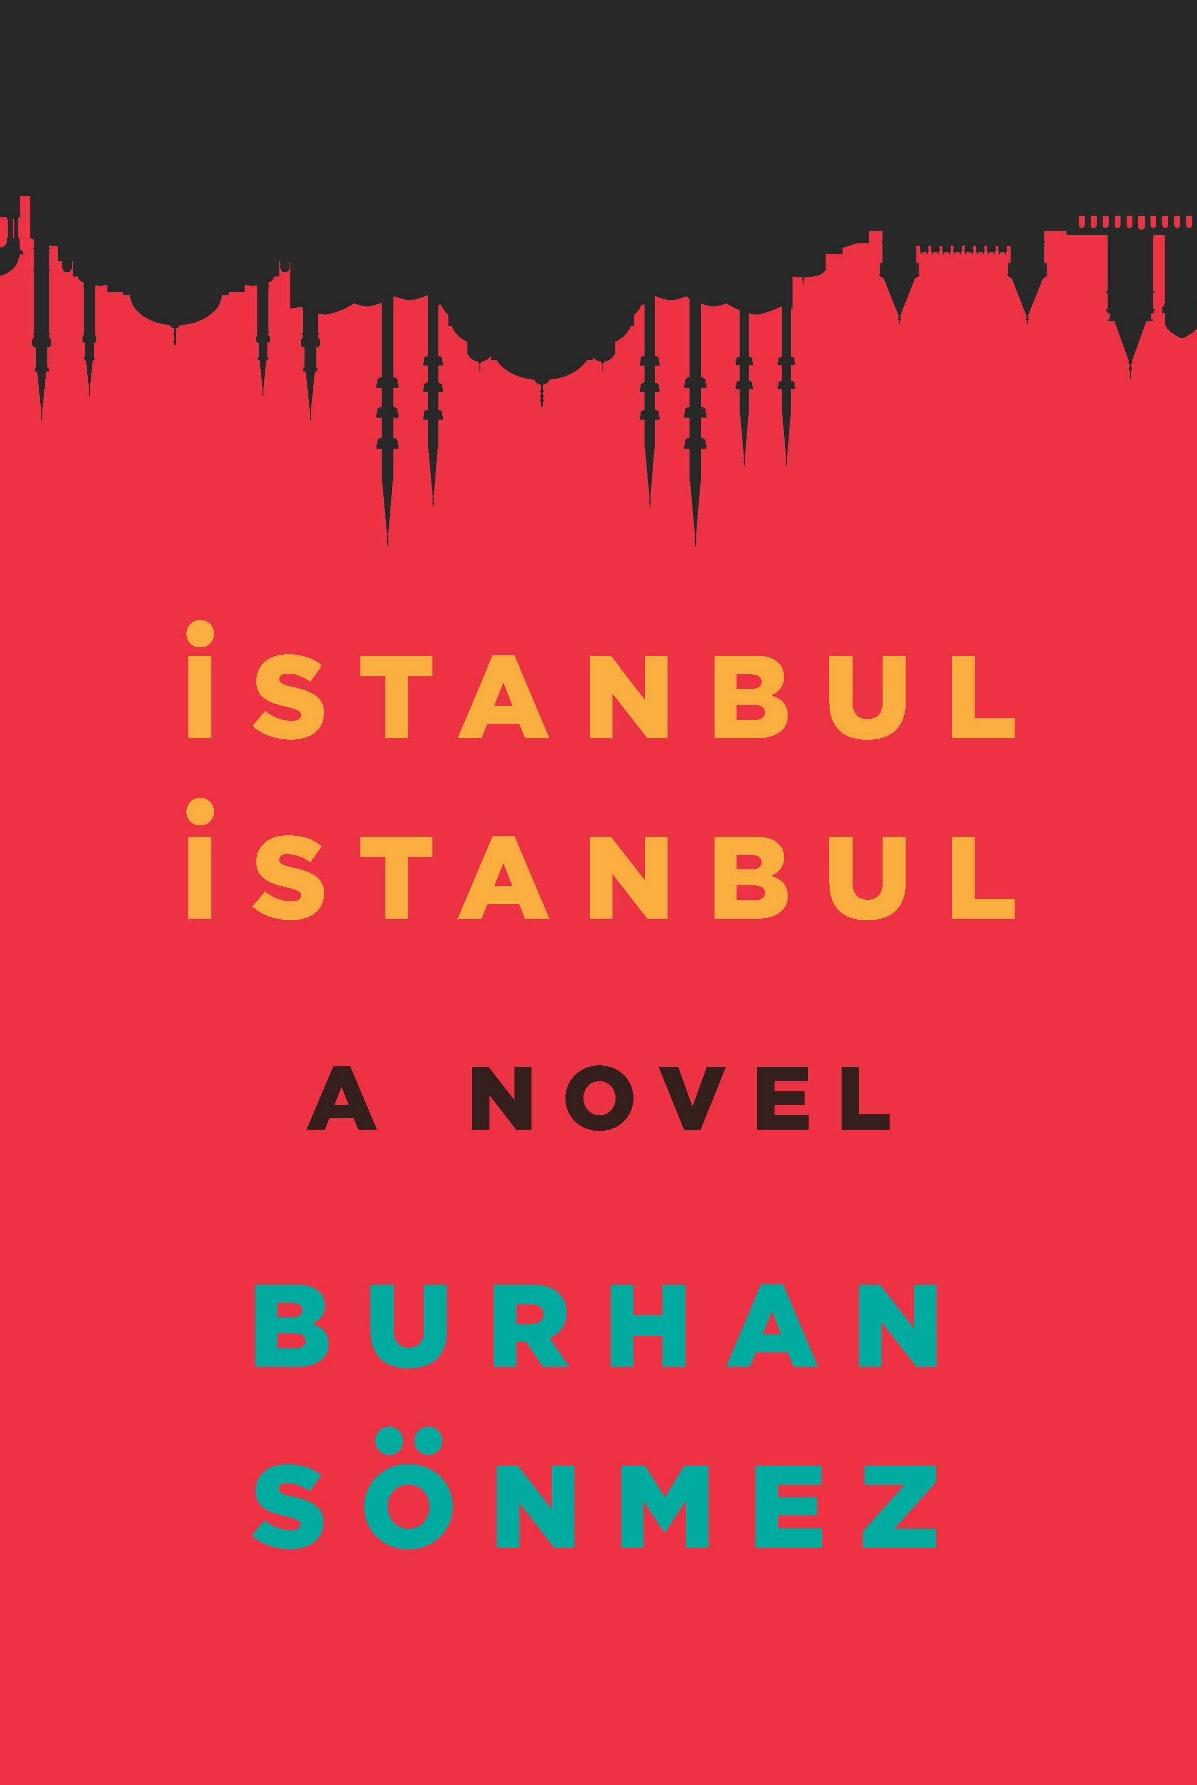 201603022532-IstanbulIstanbul.jpg